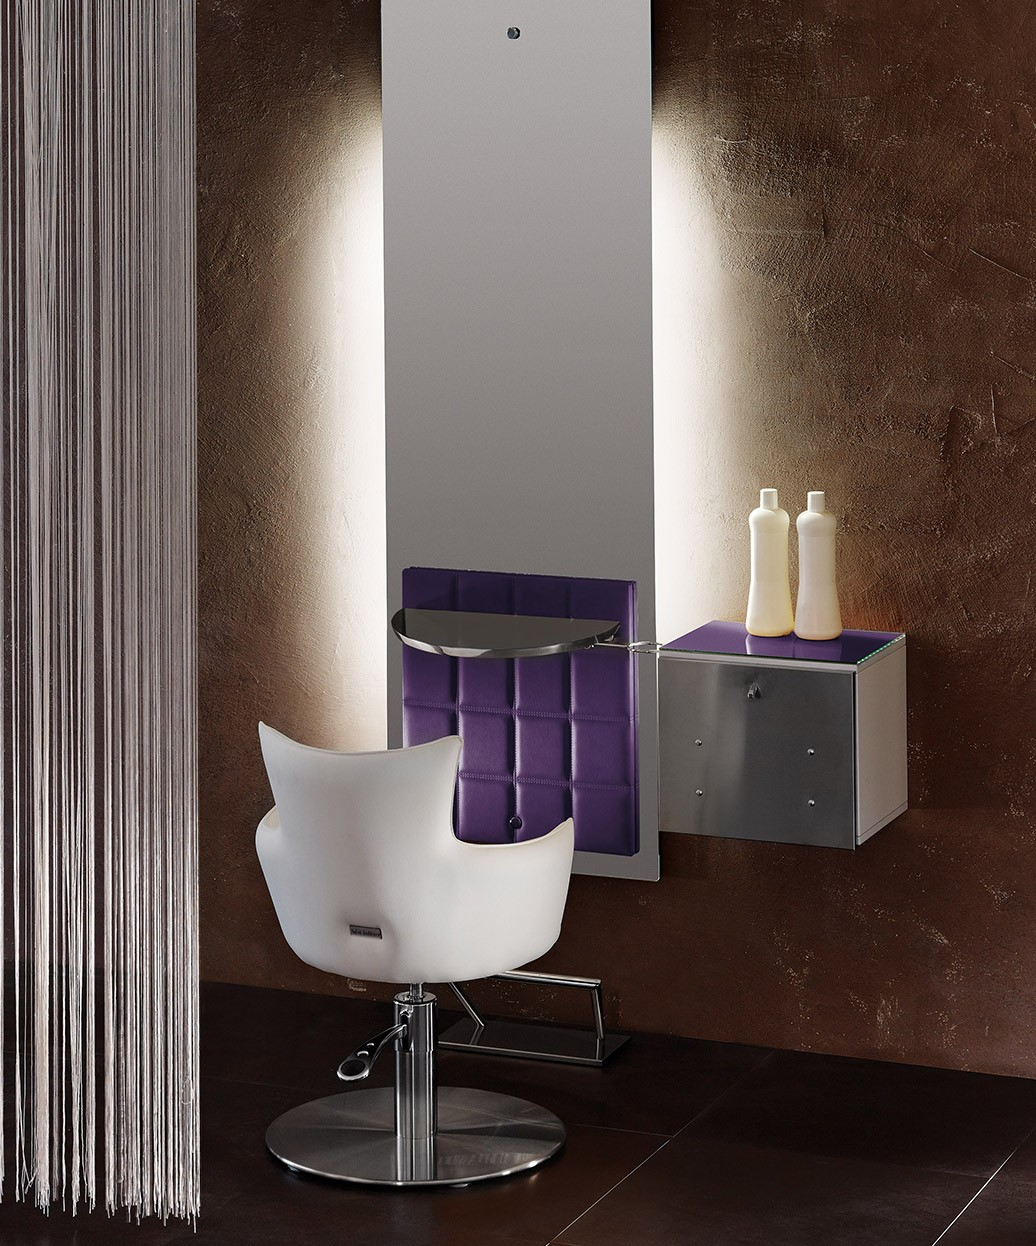 Salon Ambience Lisboa Sky Mirror Styling Station w/ Storage